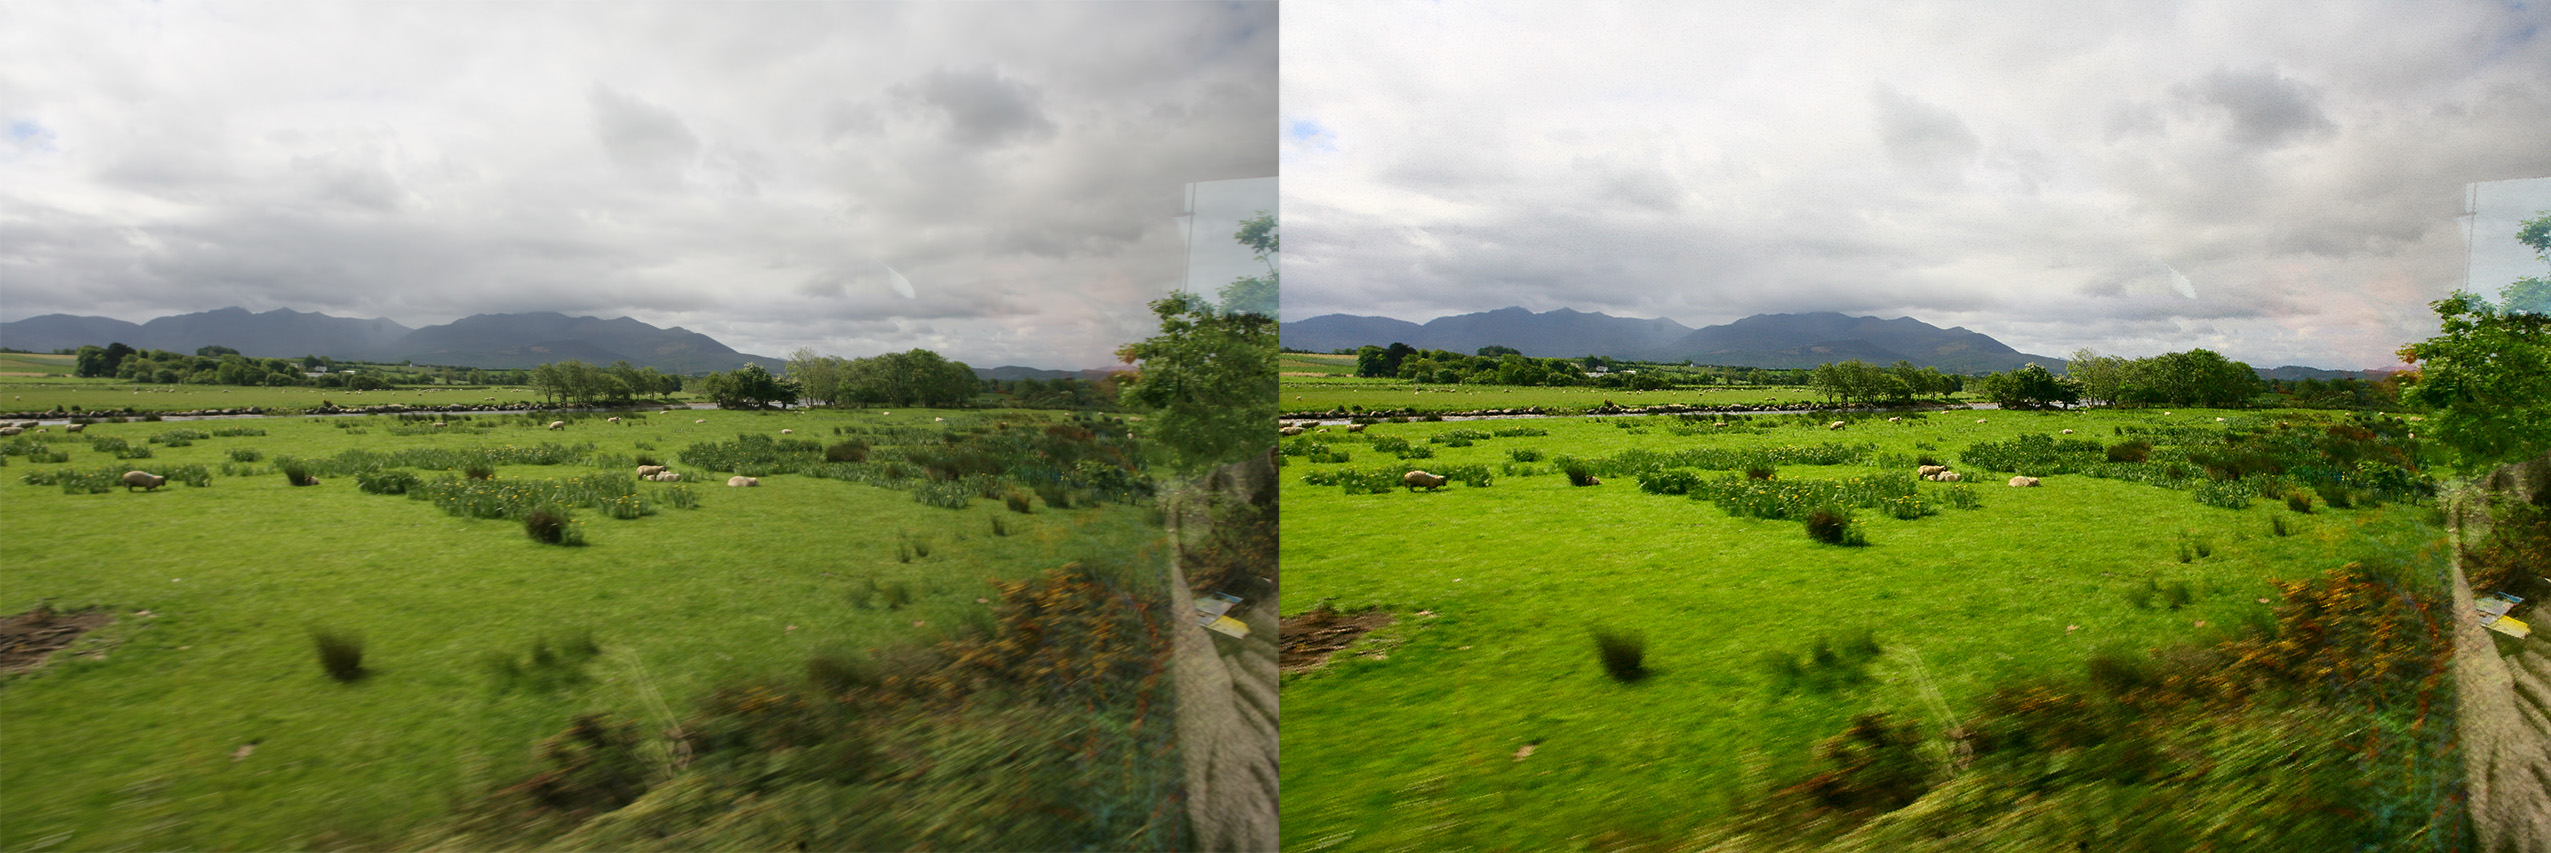 Photoshop: Оживление вялой картинки